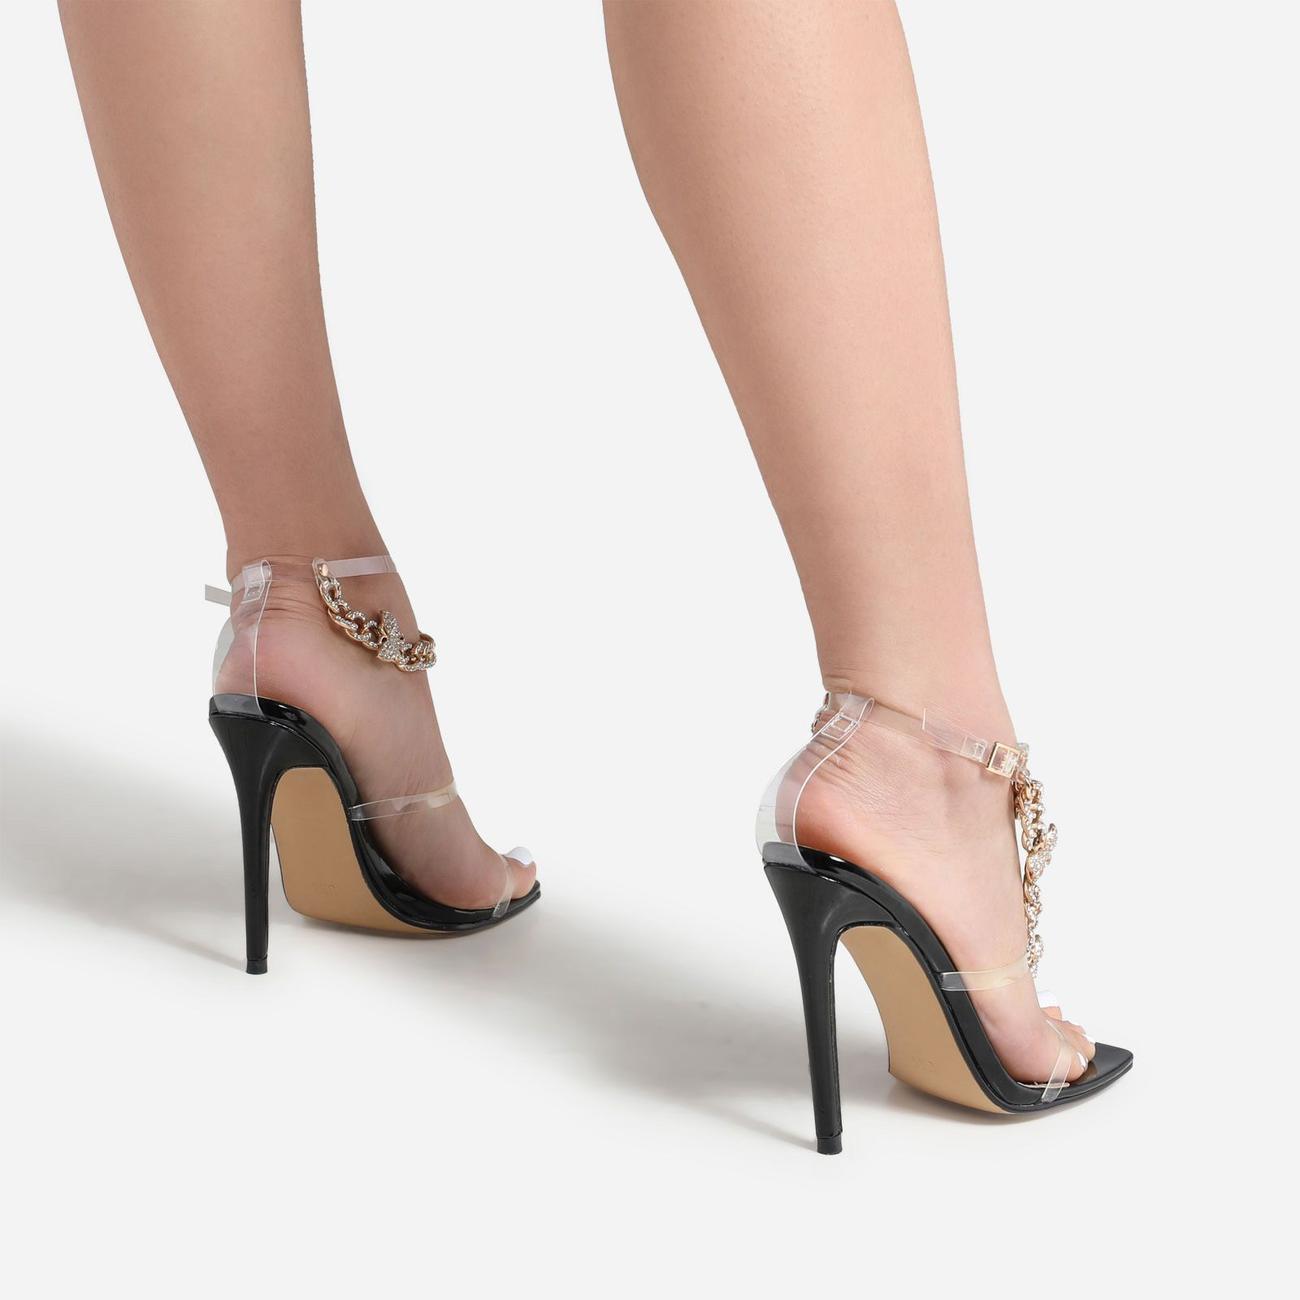 Cabana Diamante Gem Chain Detail Square Toe Heel In Black Patent Image 3